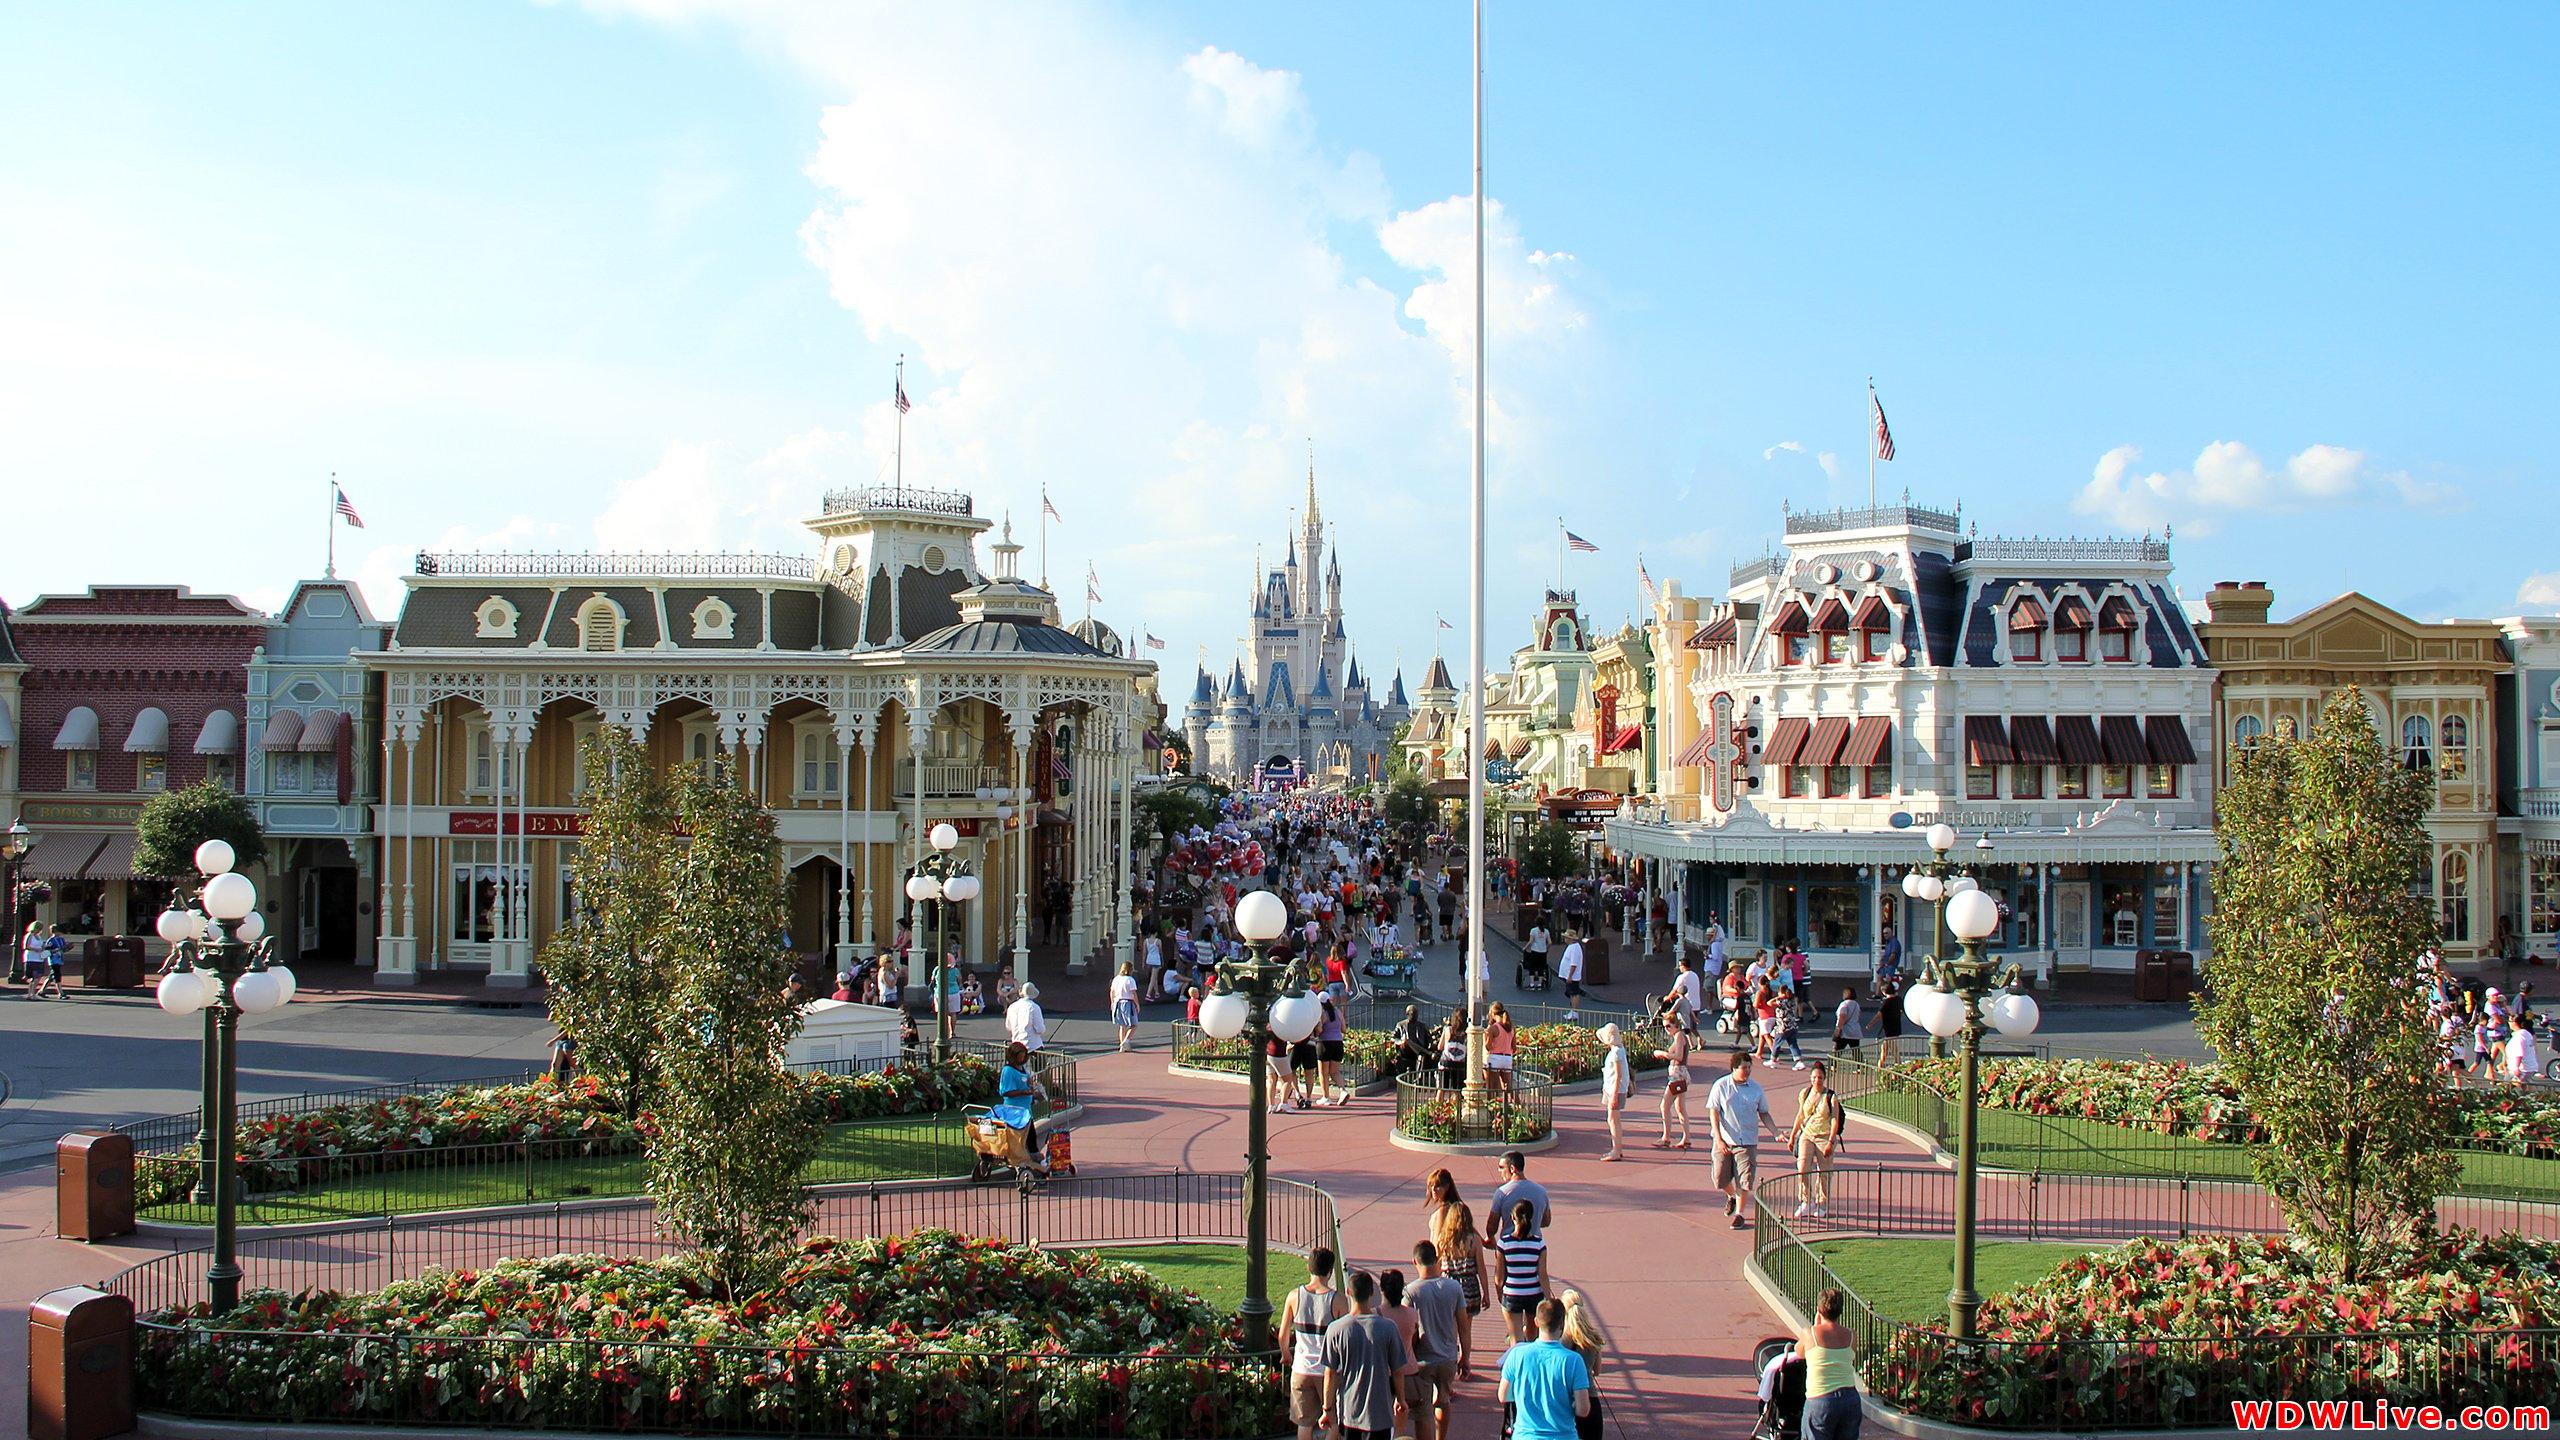 Cinderella Castle A beautiful sunny day in the Magic Kingdom 2560x1440